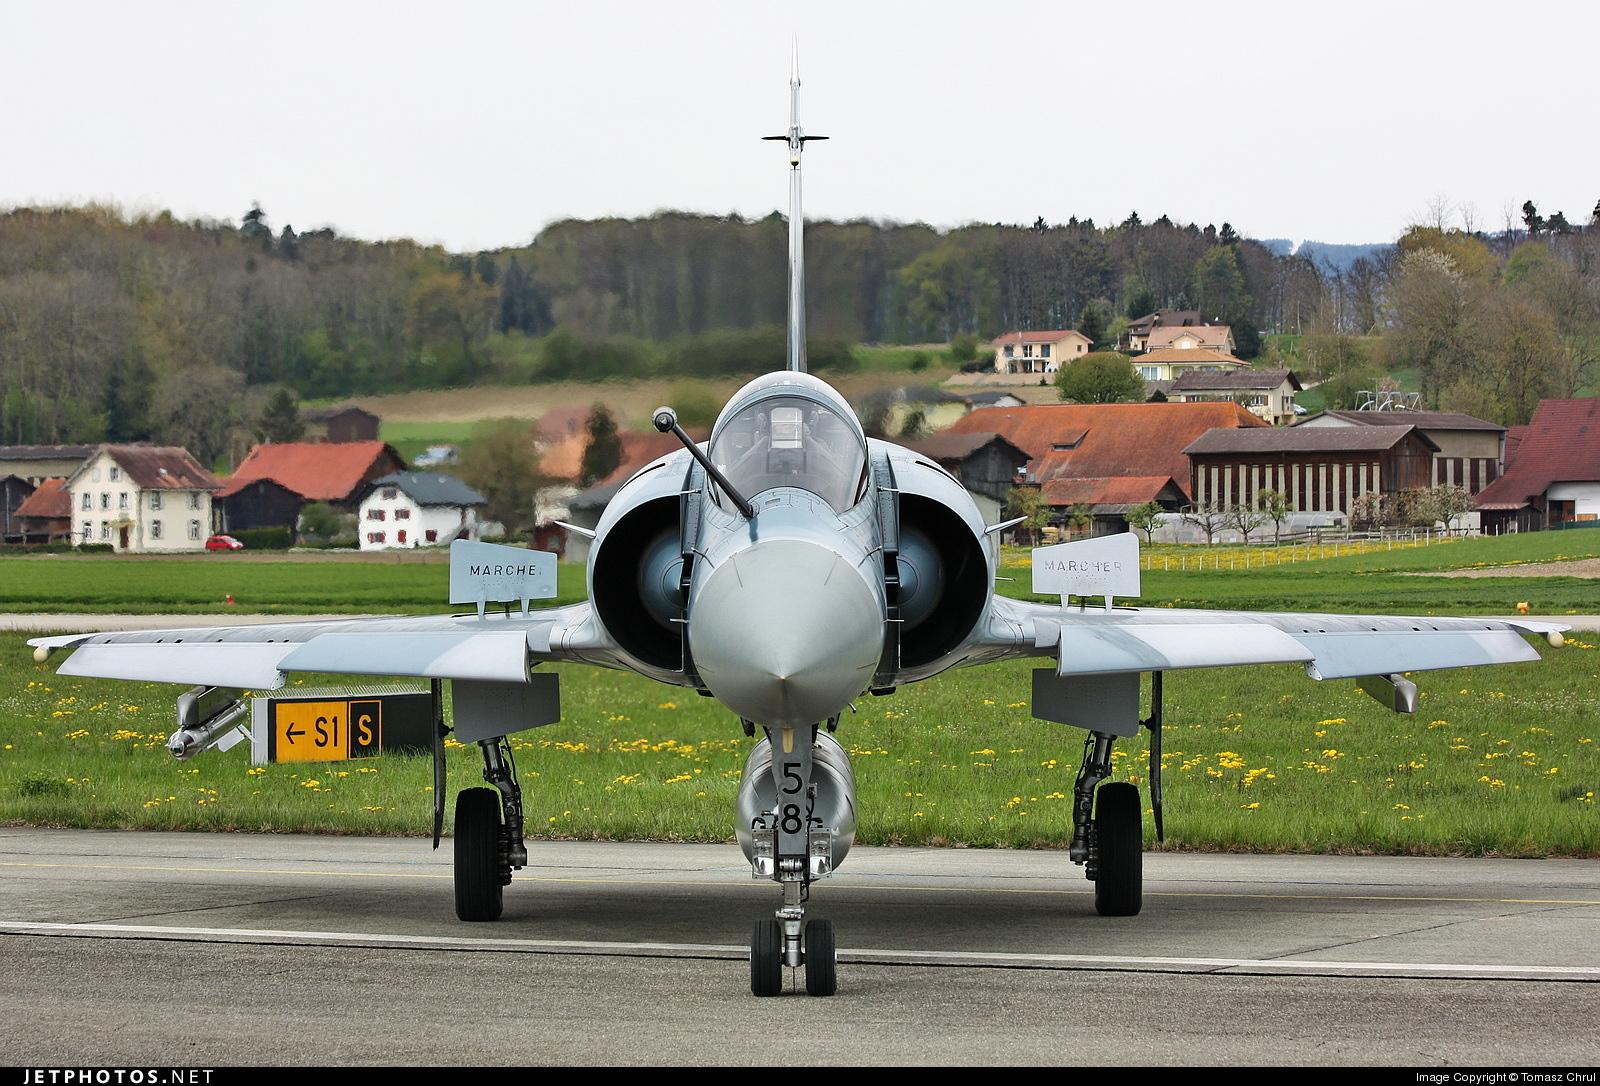 58 - Dassault Mirage 2000-5F - France - Air Force